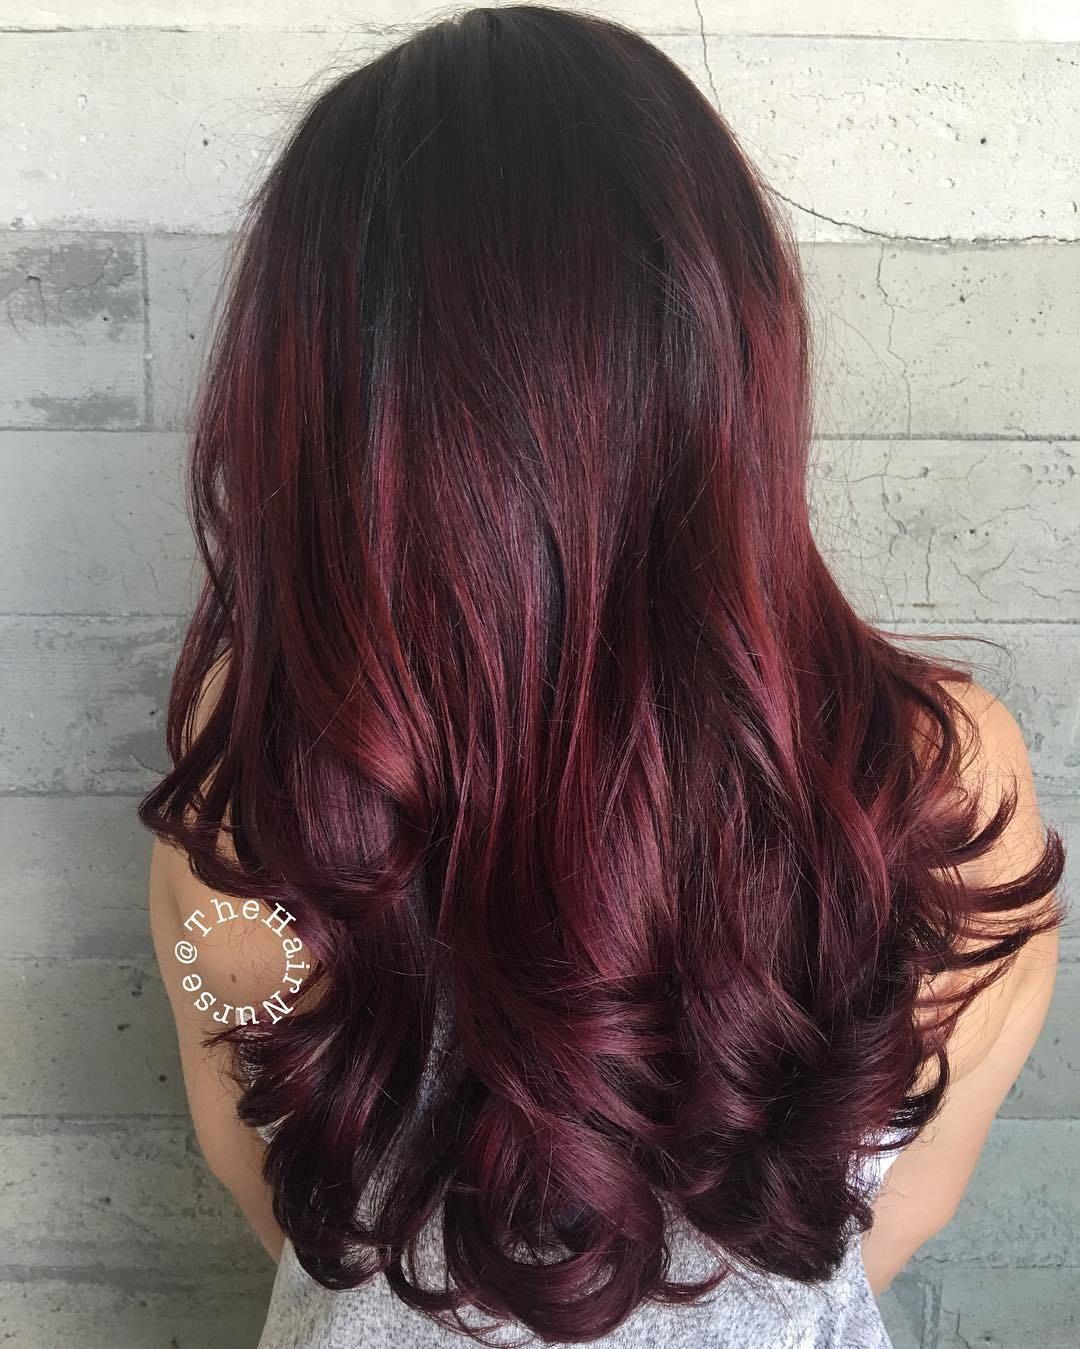 45 shades of burgundy hair: dark burgundy, maroon, burgundy with